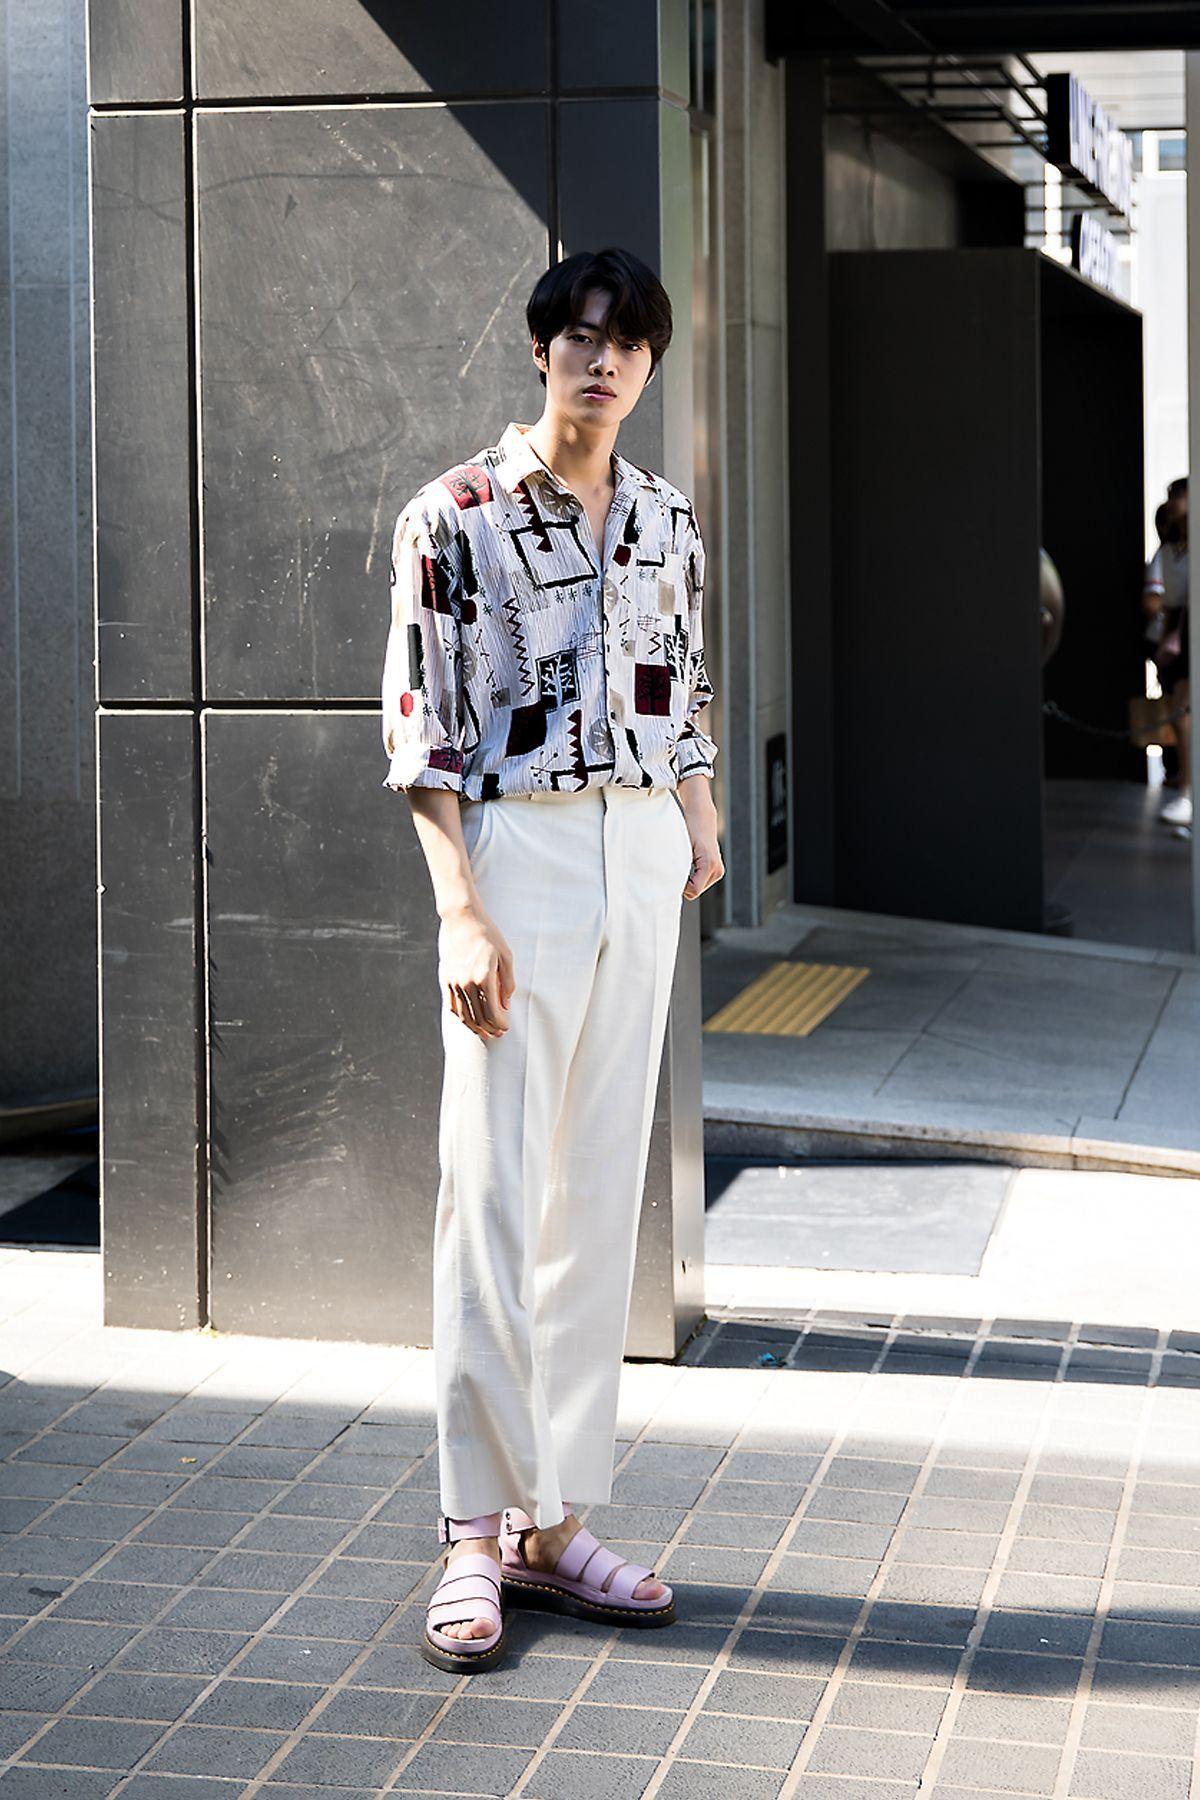 Ko Woongho, Street Fashion 8 in Seoul  Korean street fashion